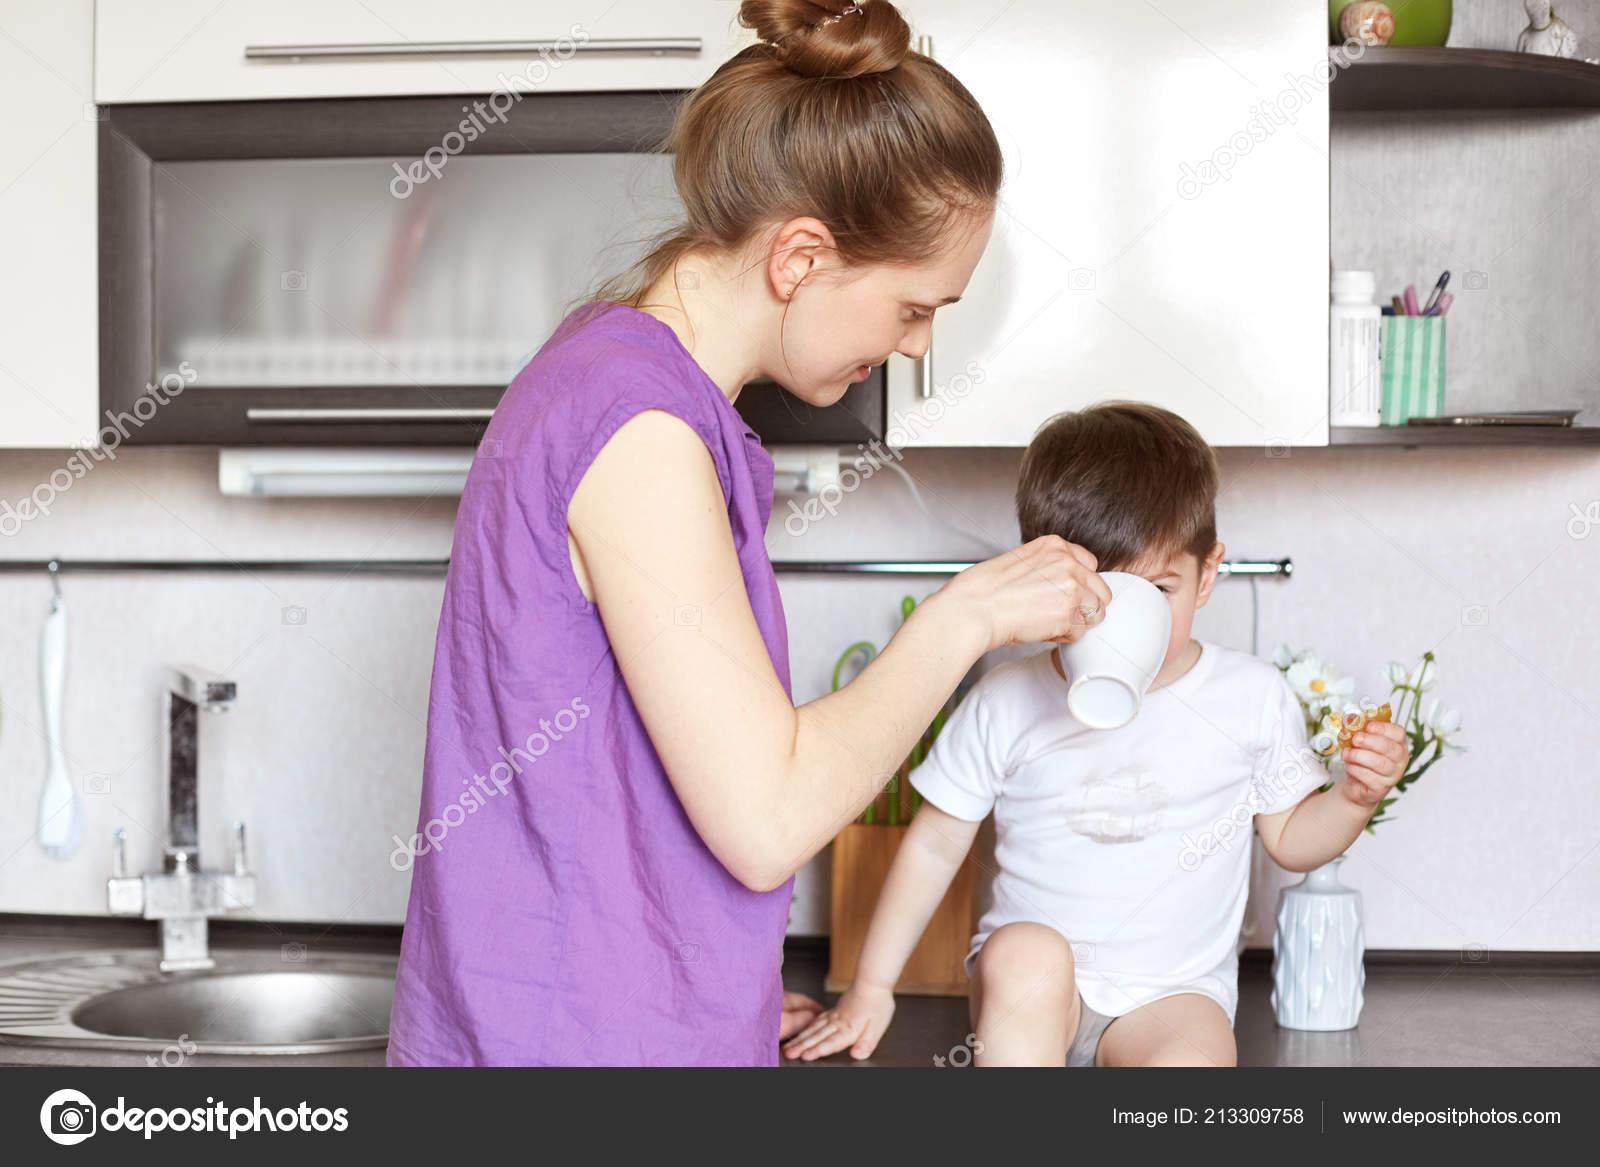 Сын трахнув маму в попу на кухни, Сын ебет маму в жопу на кухне - порно видео онлайн 16 фотография